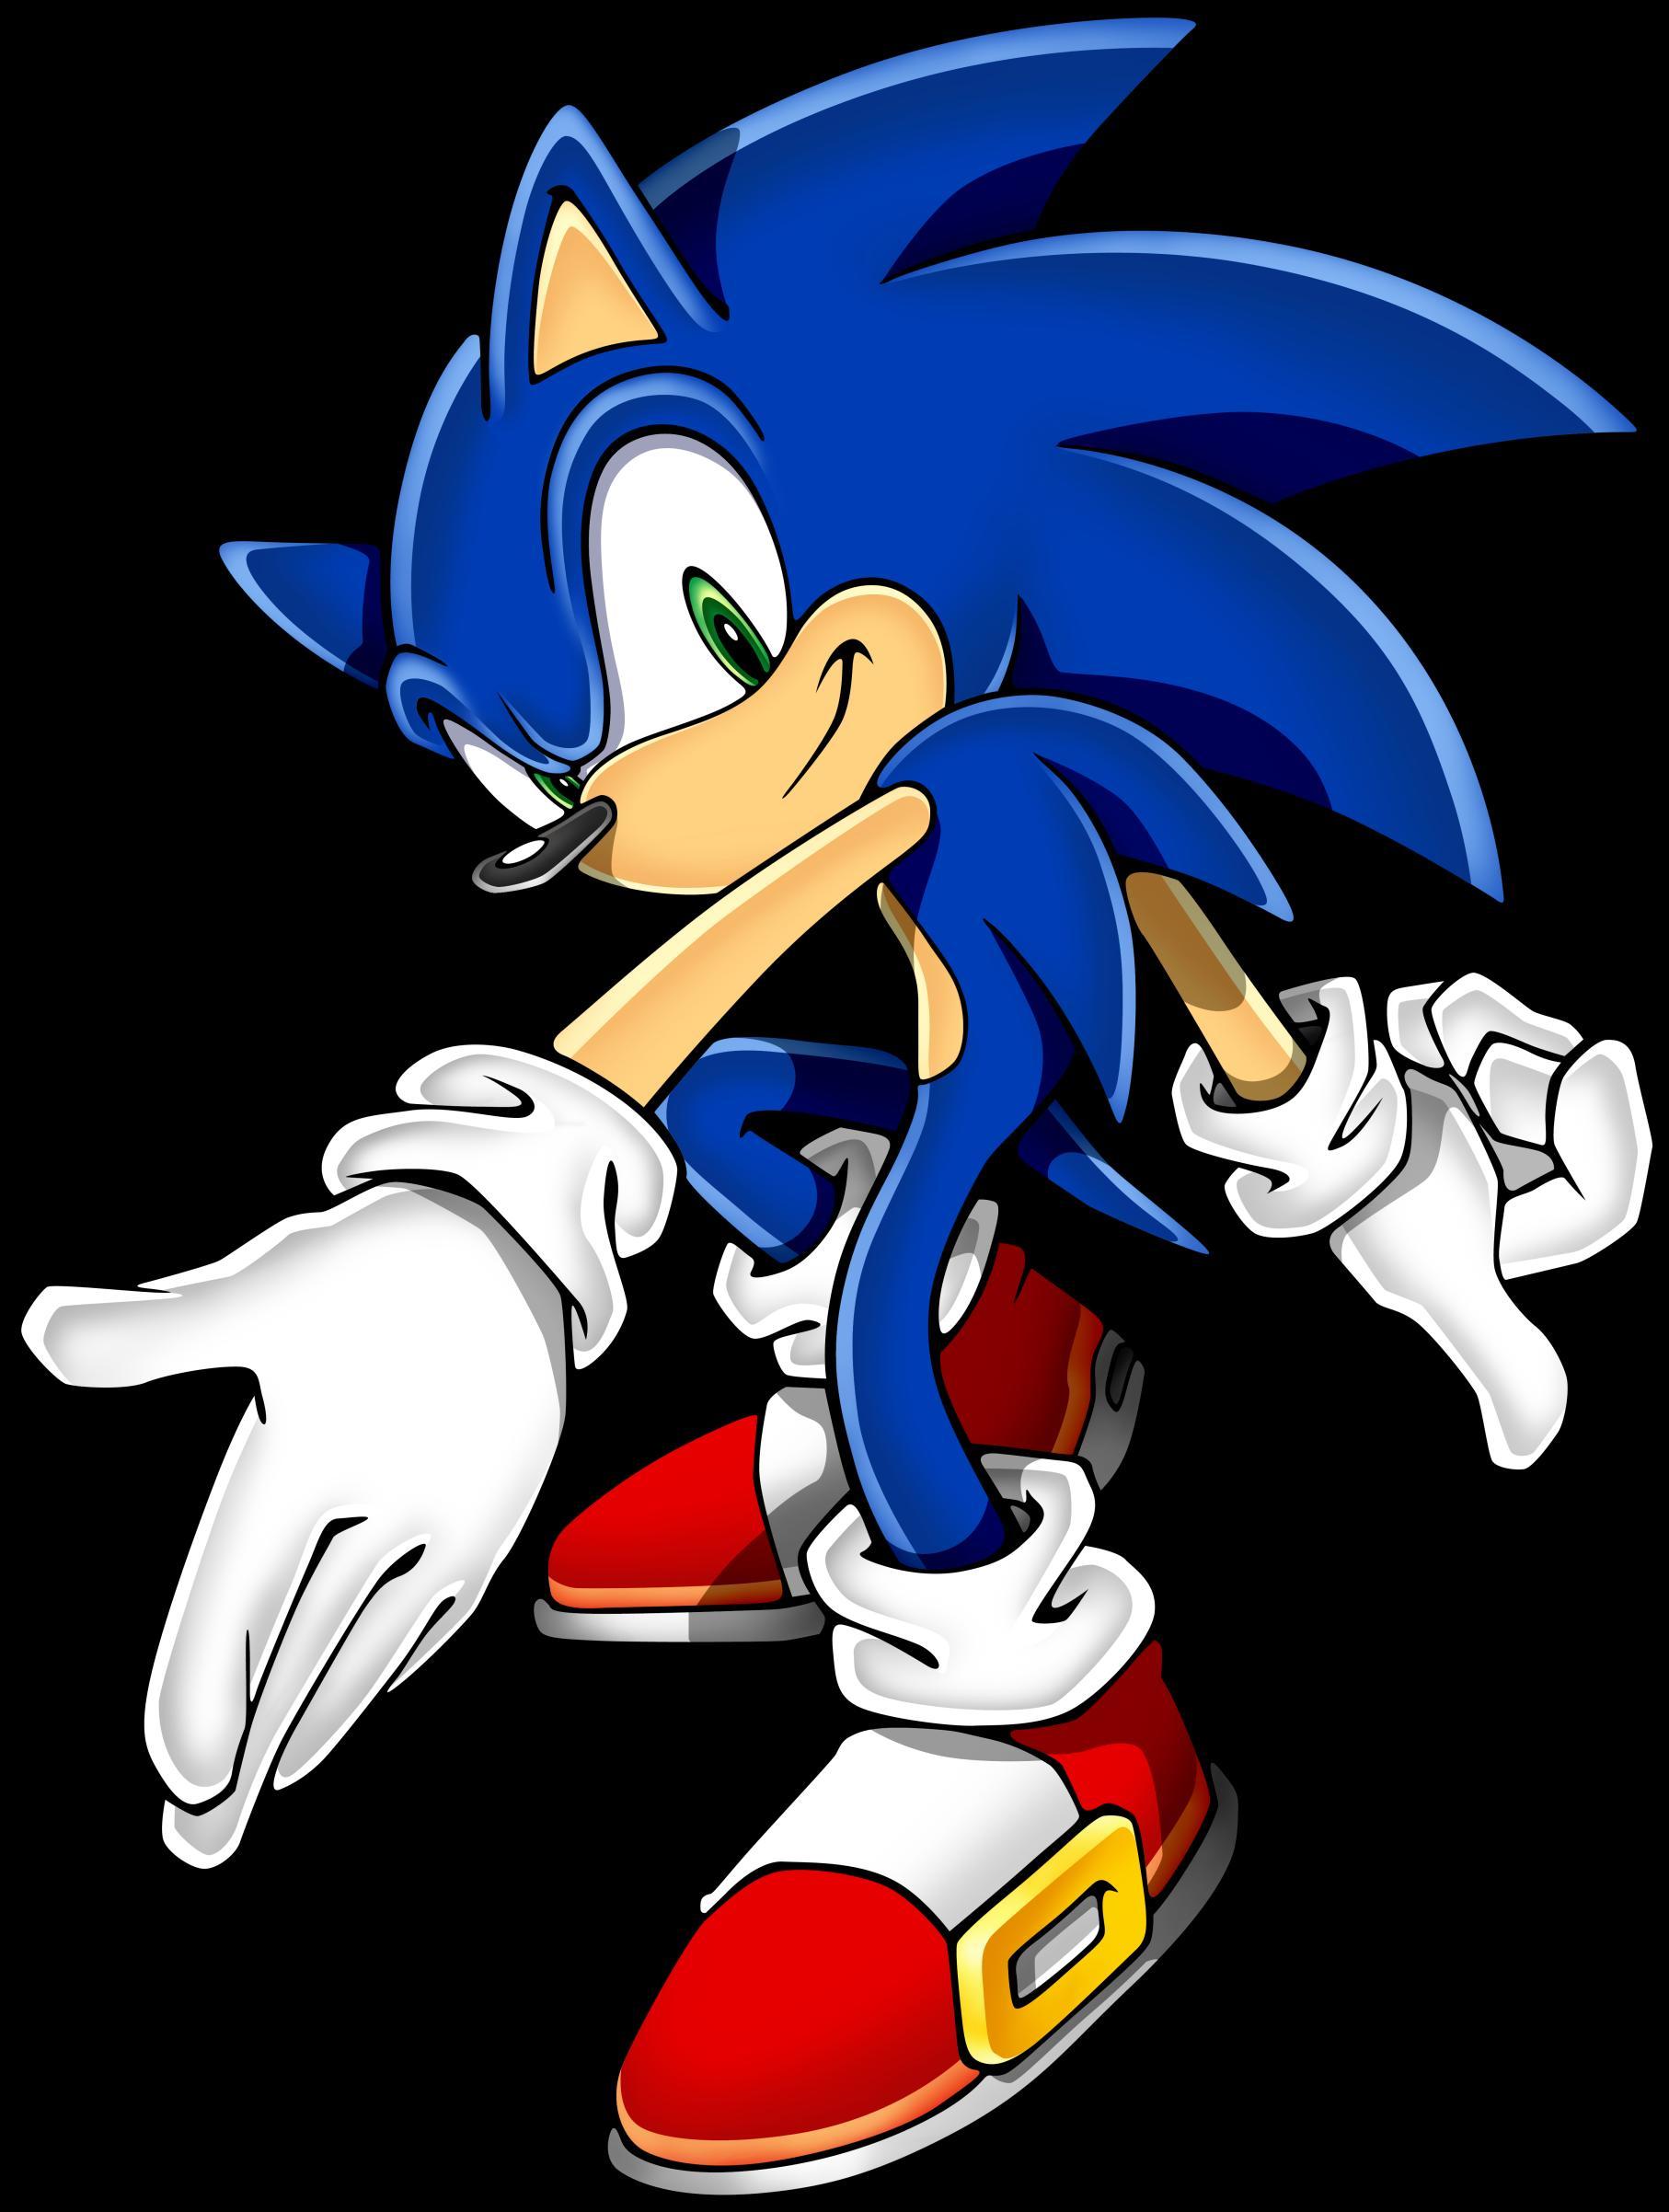 sonic the hedgehog digital - photo #9